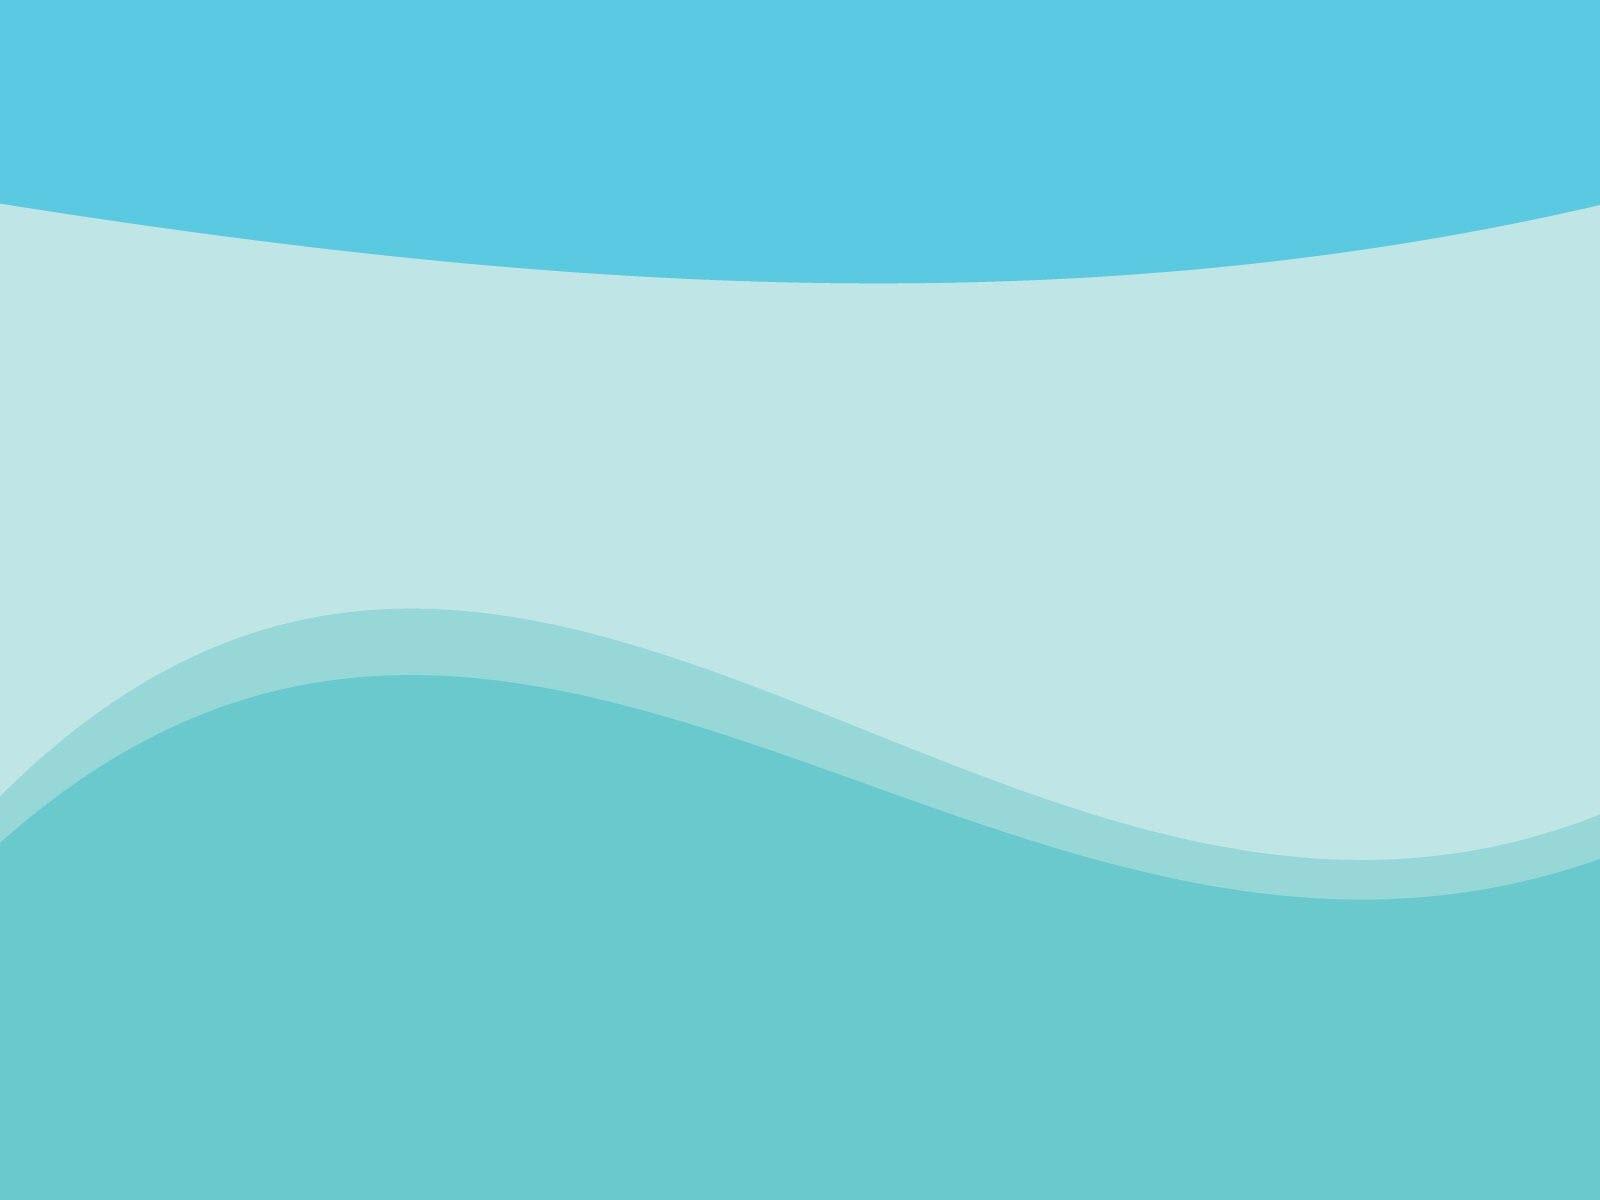 Background powerpoint màu xanh dương